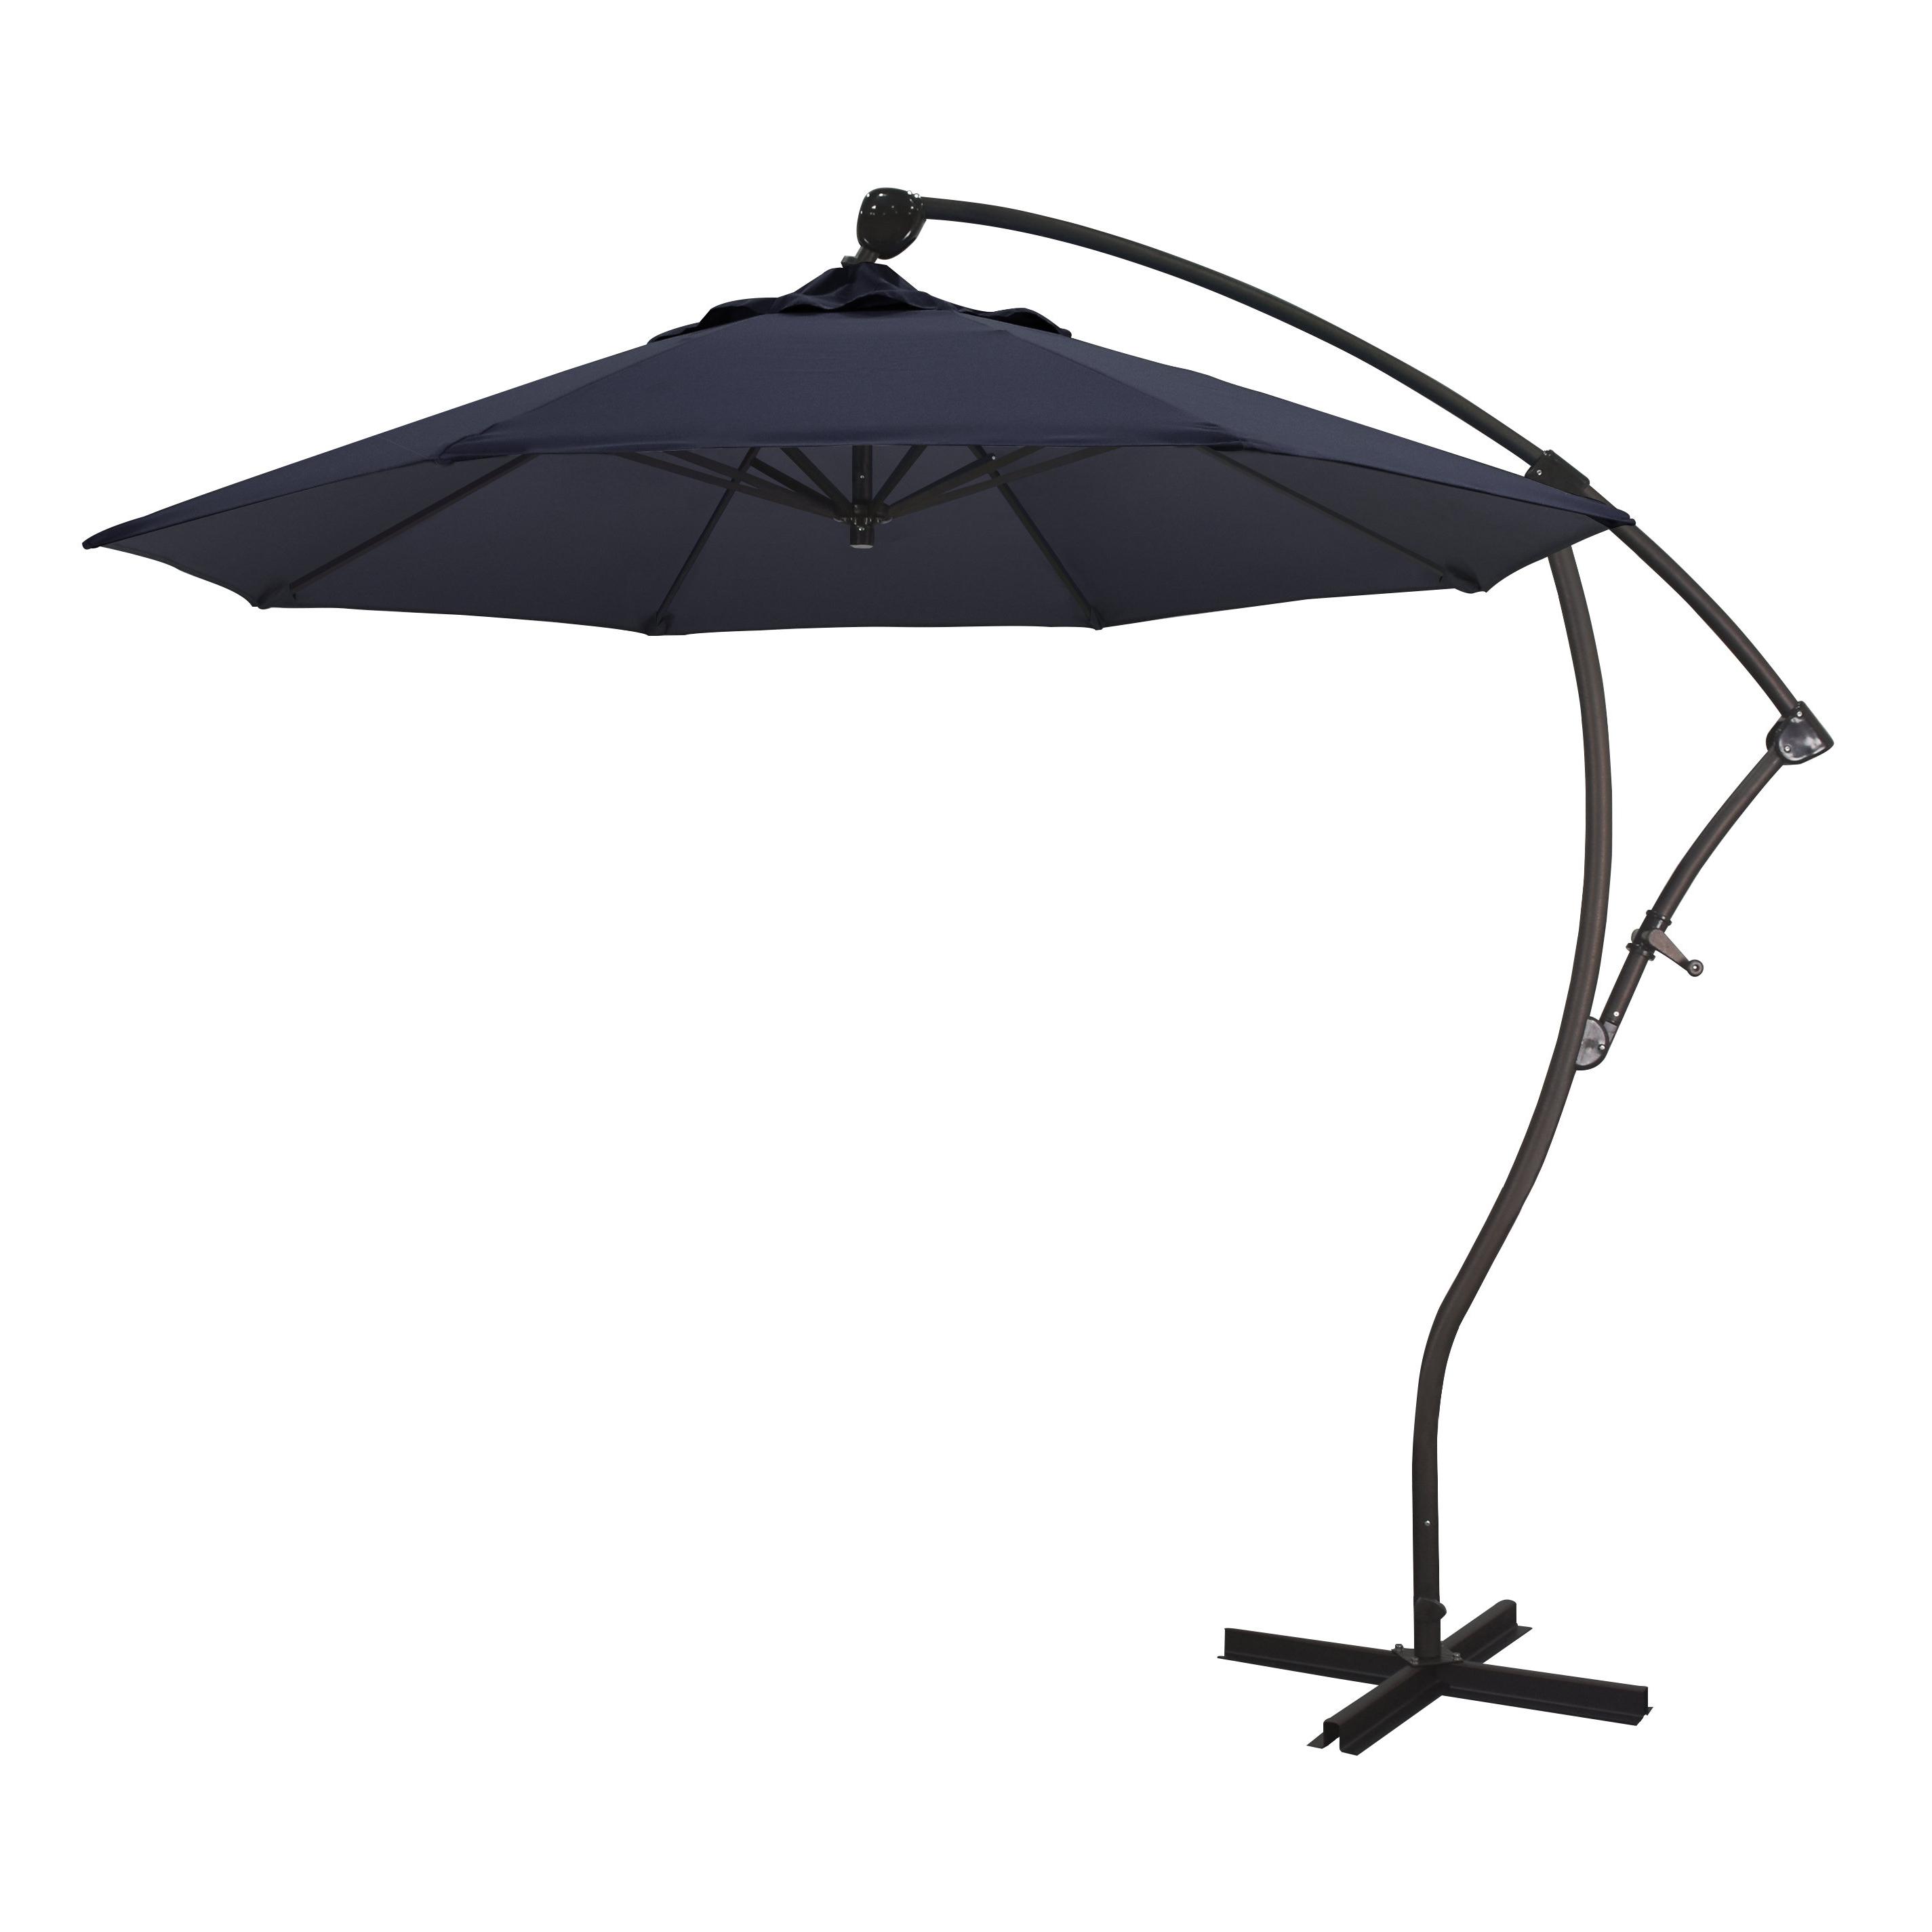 Capri 9' Cantilever Umbrella With Regard To Current Trotman Cantilever Umbrellas (View 5 of 20)